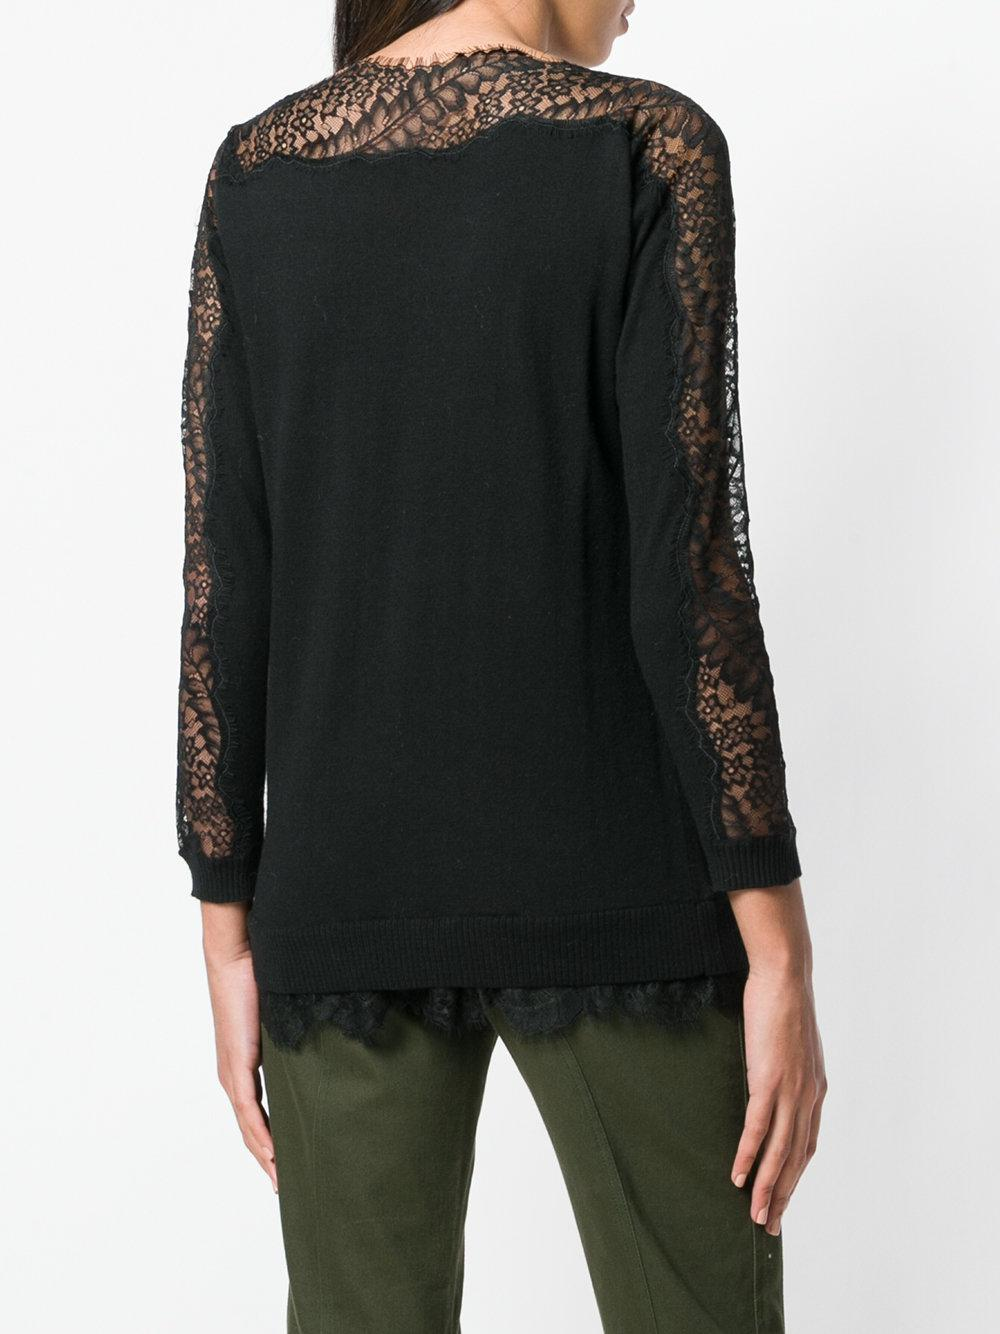 Twin Set Lace Knit Sweater in Black